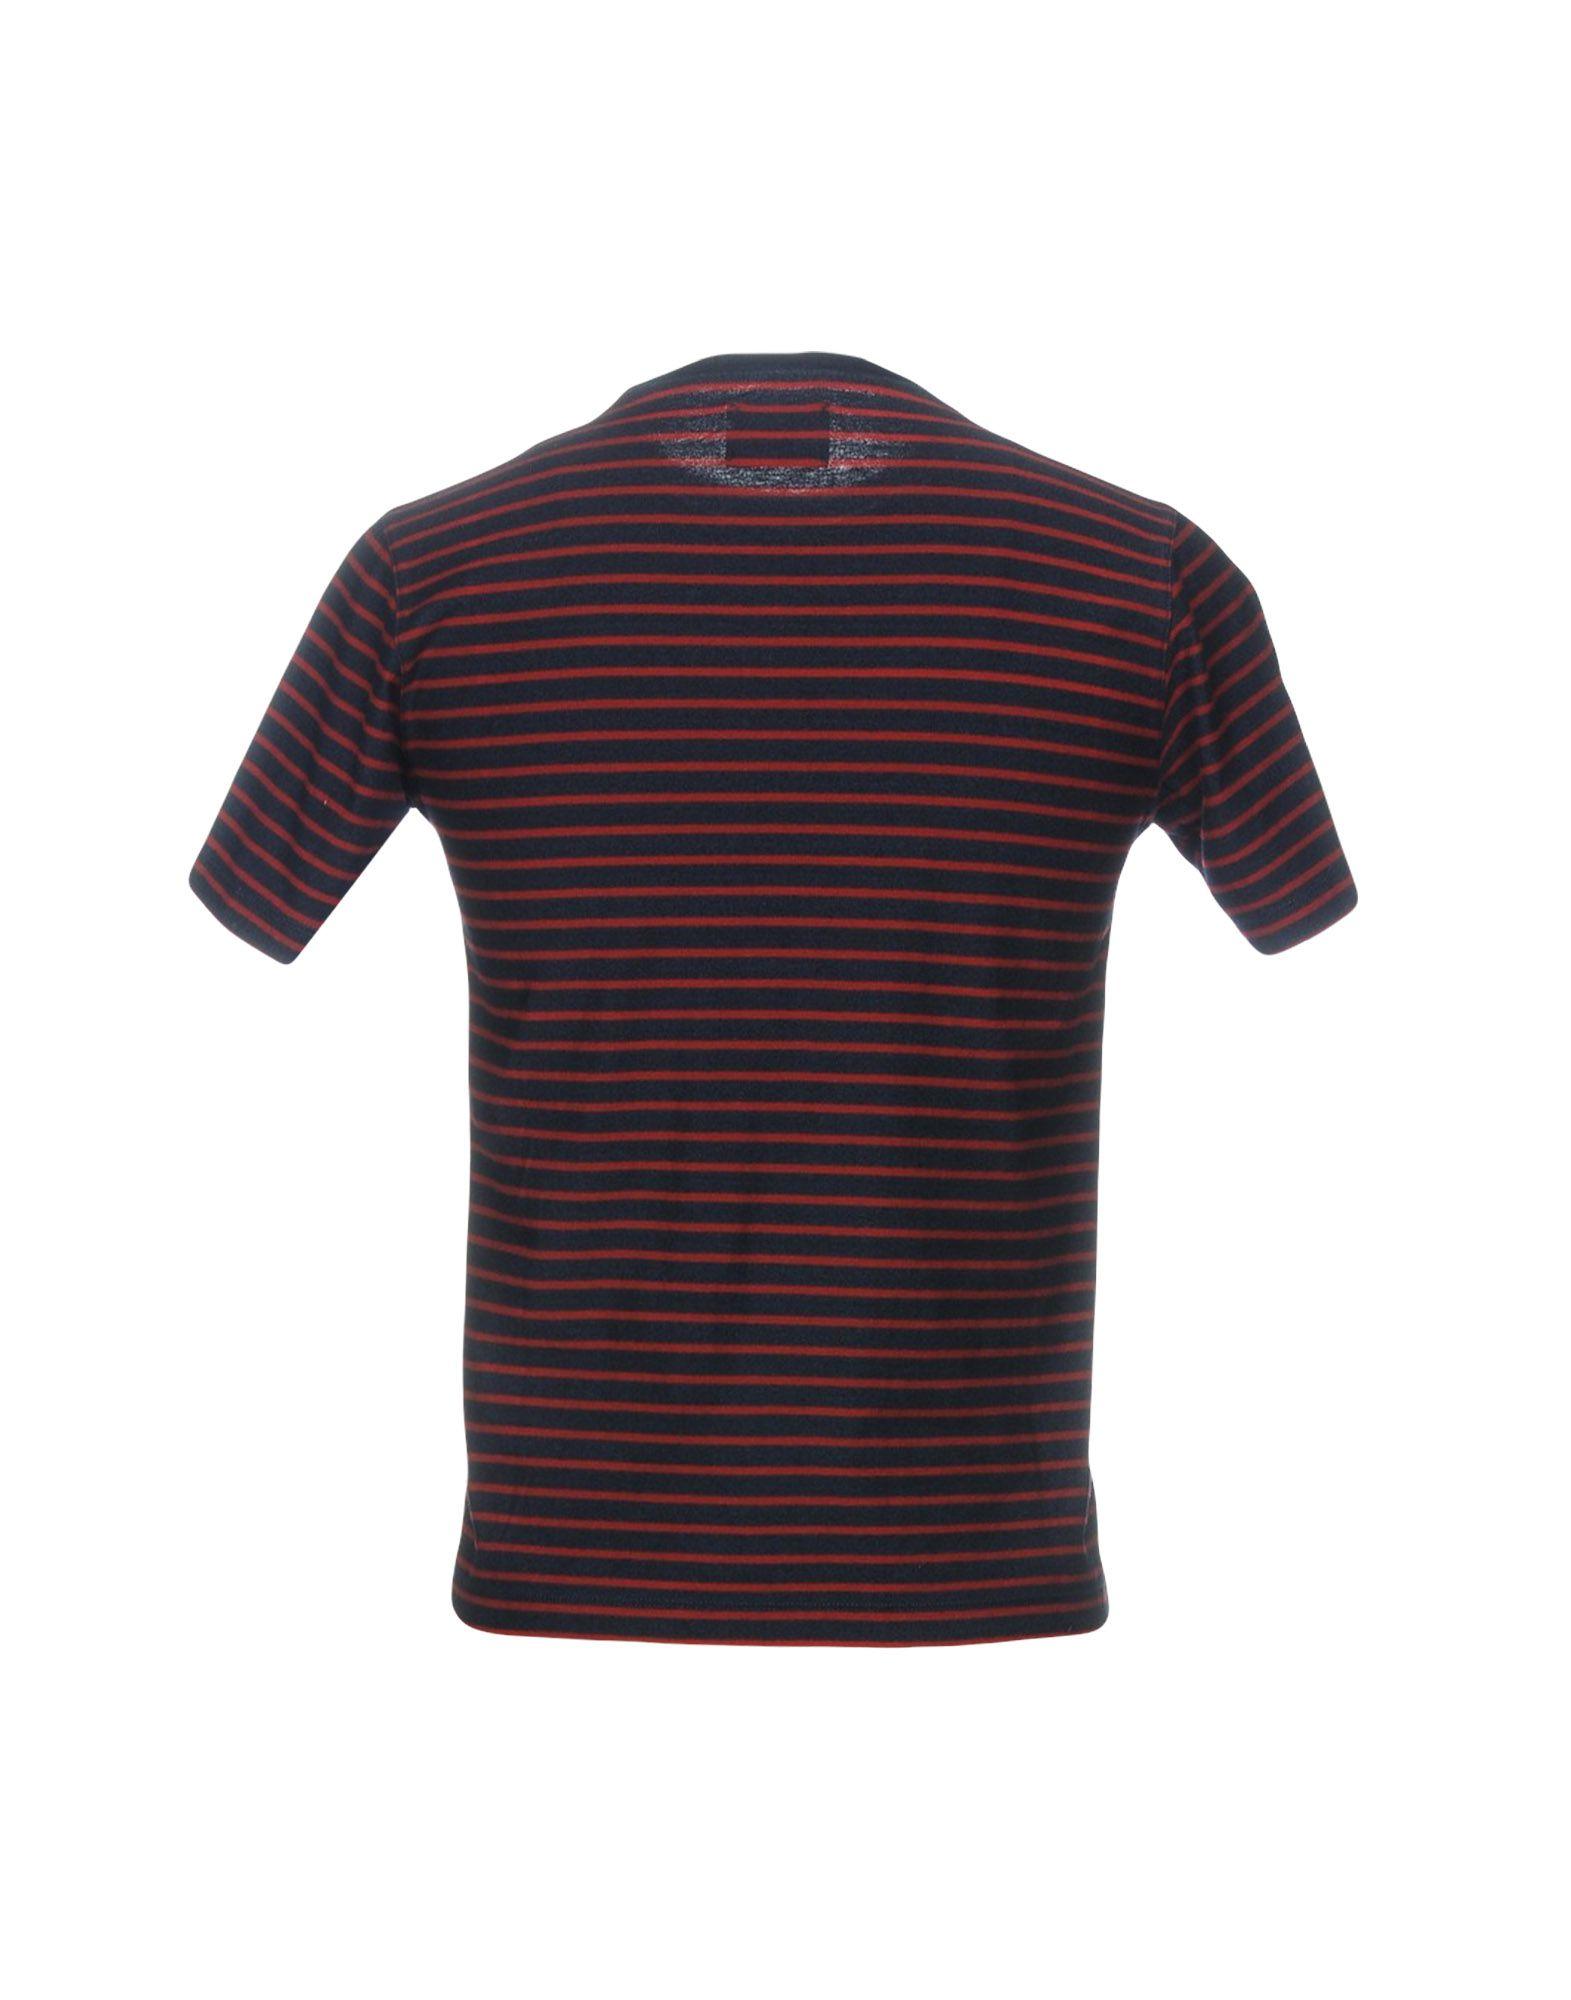 T-Shirt Altea Altea T-Shirt Dal 1973 Uomo - 12162817OI 6c648c